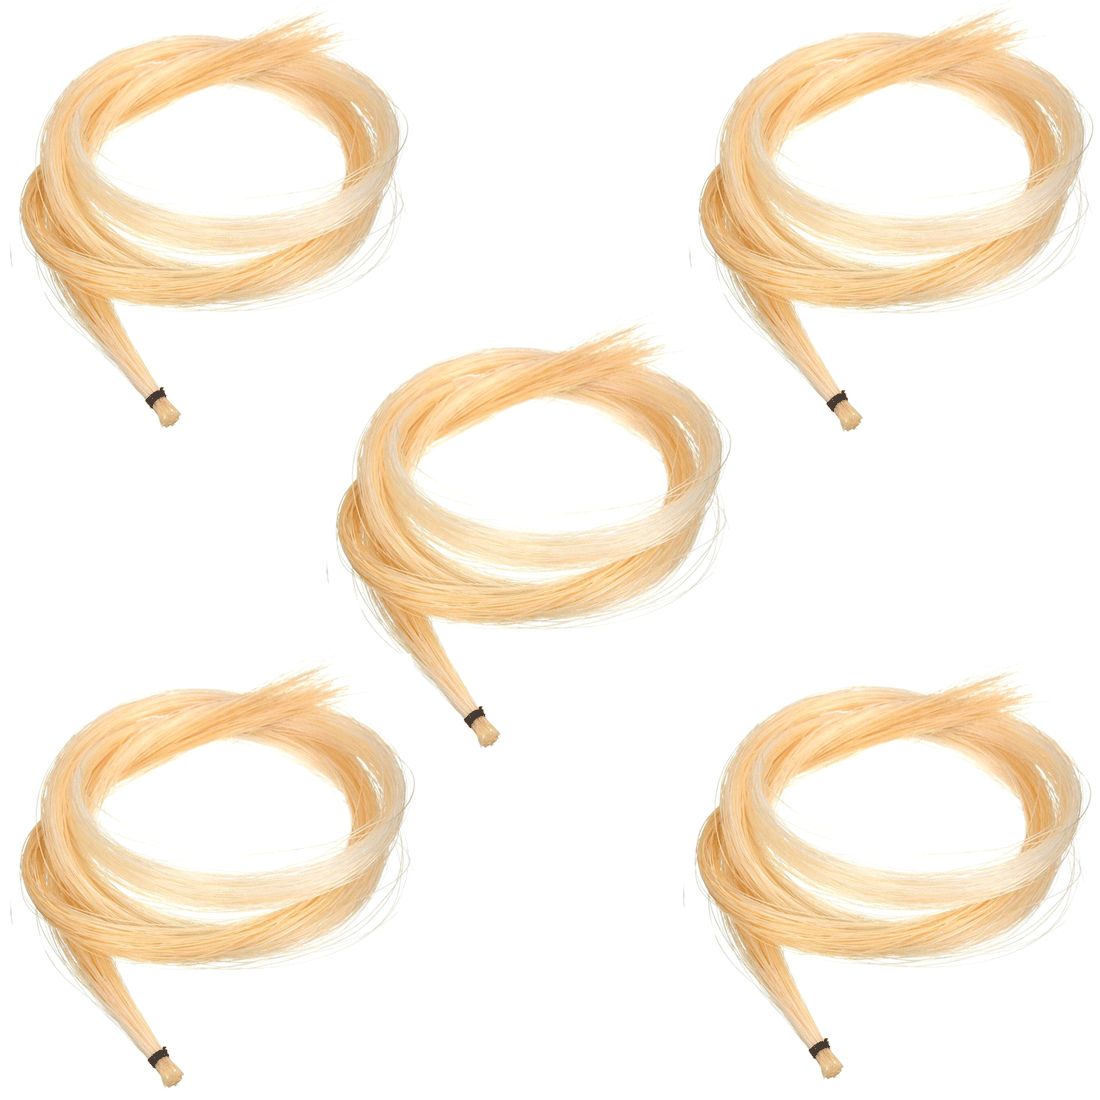 Kit com 5 crinas animal para arco violino/viola/violoncelo